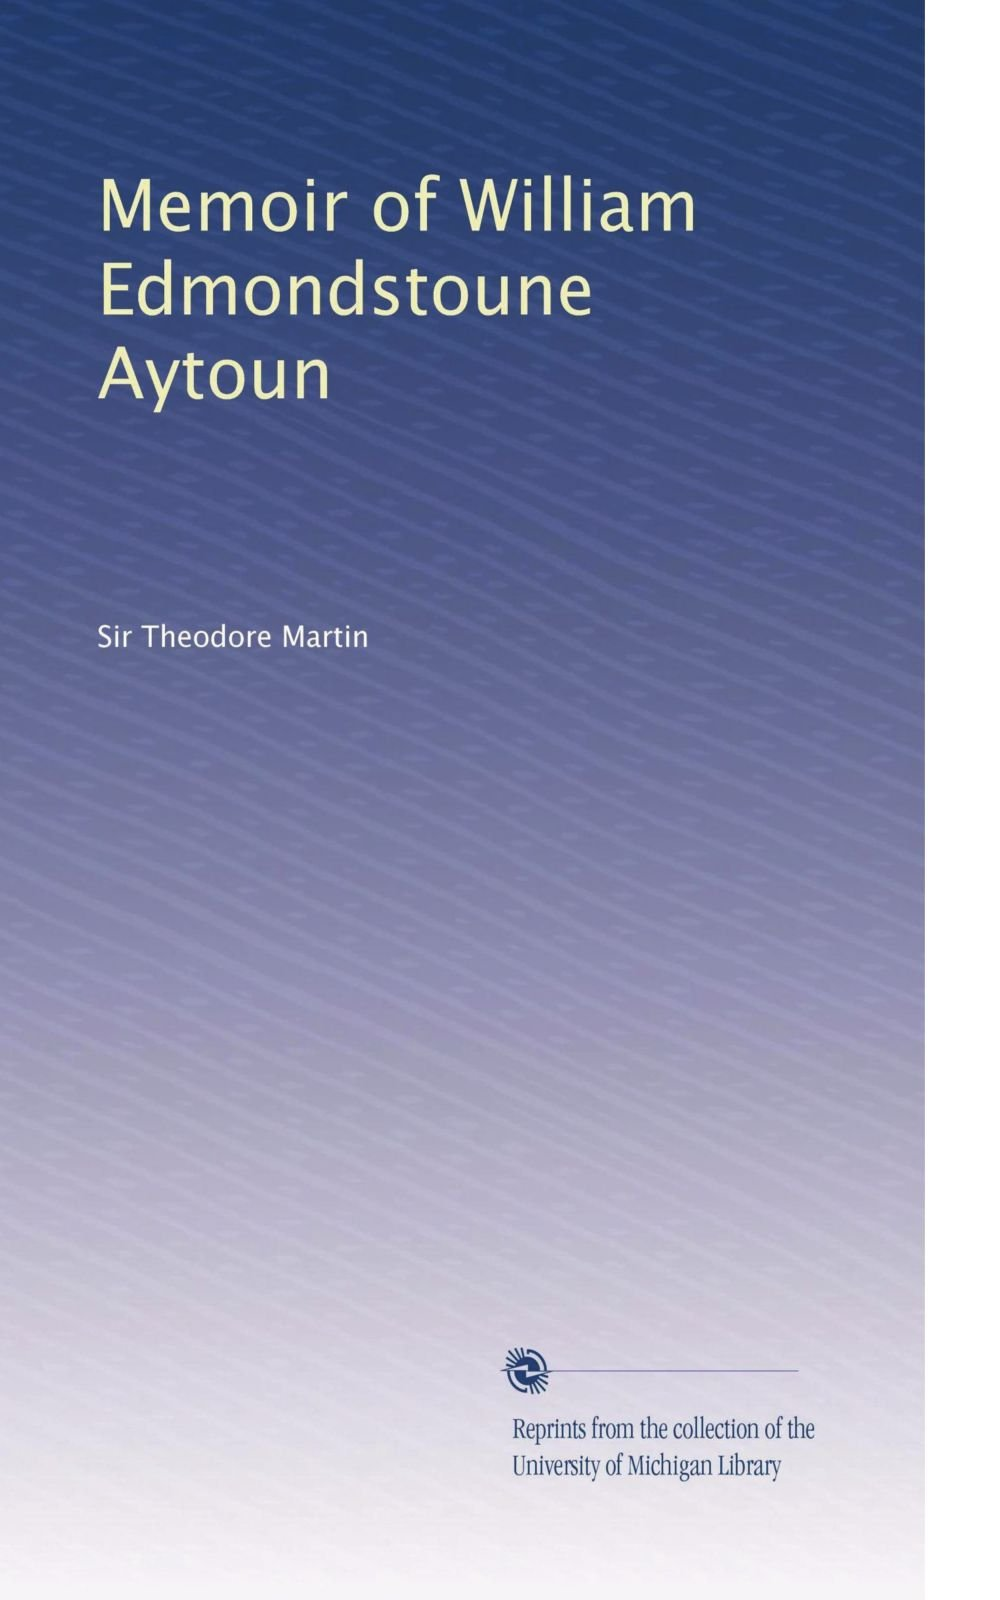 Memoir of William Edmondstoune Aytoun pdf